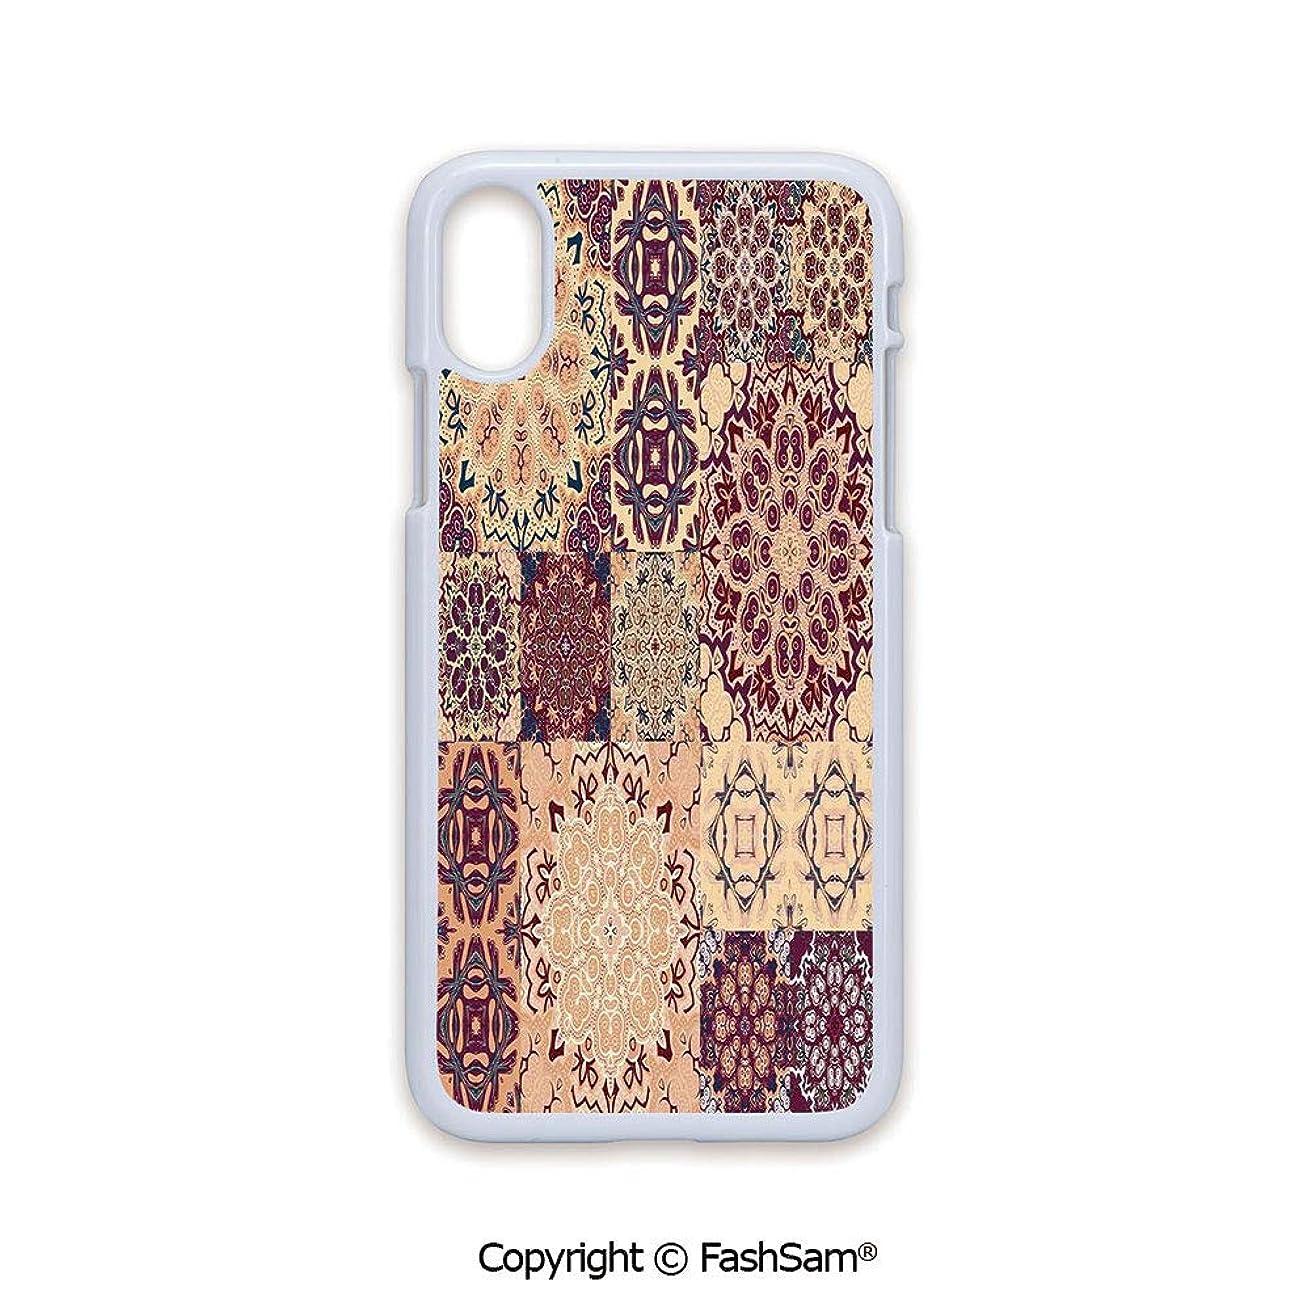 Plastic Rigid Mobile Phone case Compatible with iPhone X Black Edge Large Set of Colorful Vintage Ceramic Tiles Arabesque Authentic Floral Forms 2D Print Hard Plastic Phone Case